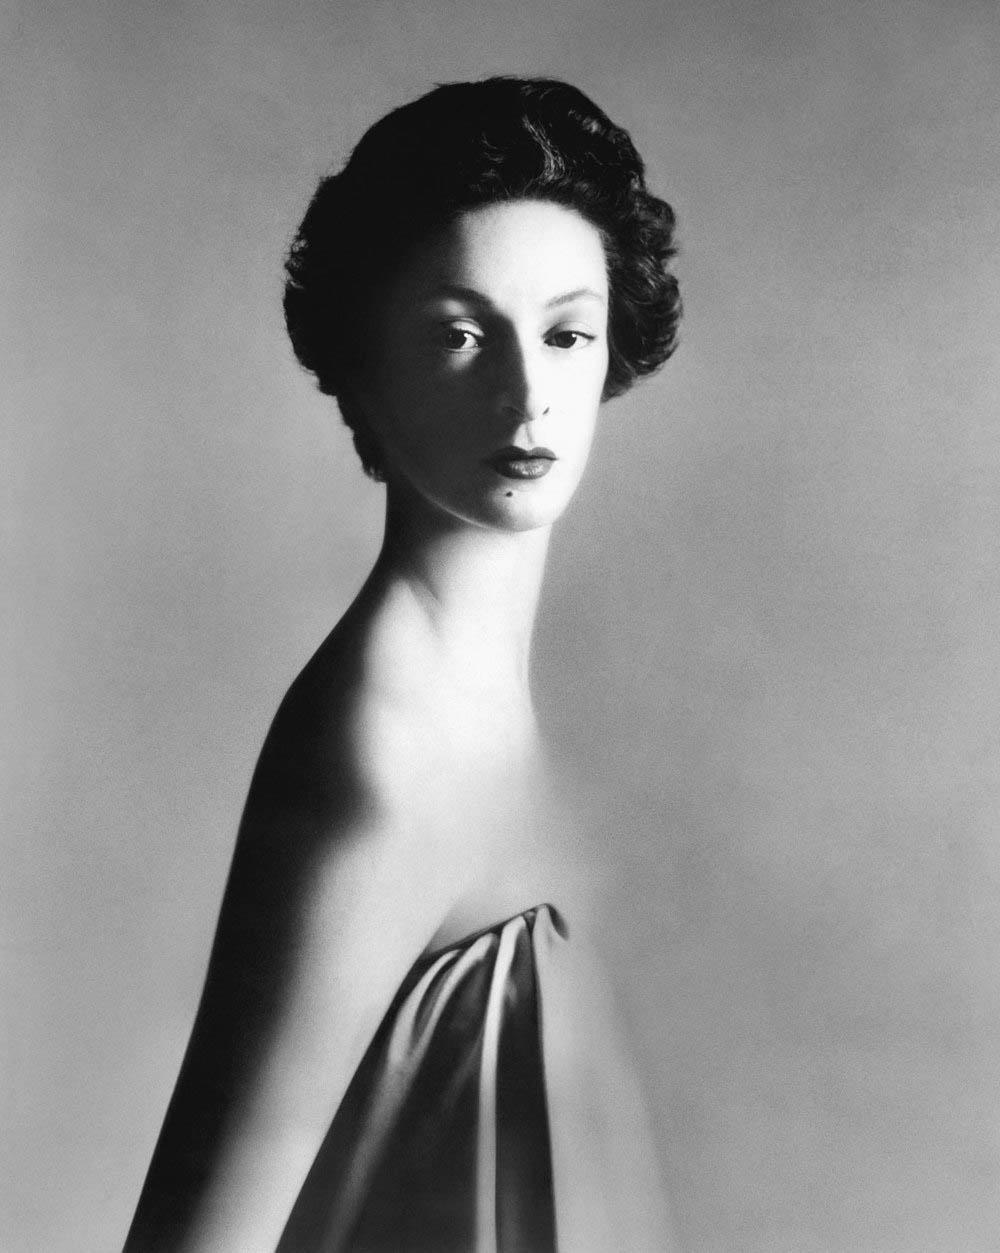 Marella Agnelli, New York, December 16, 1953